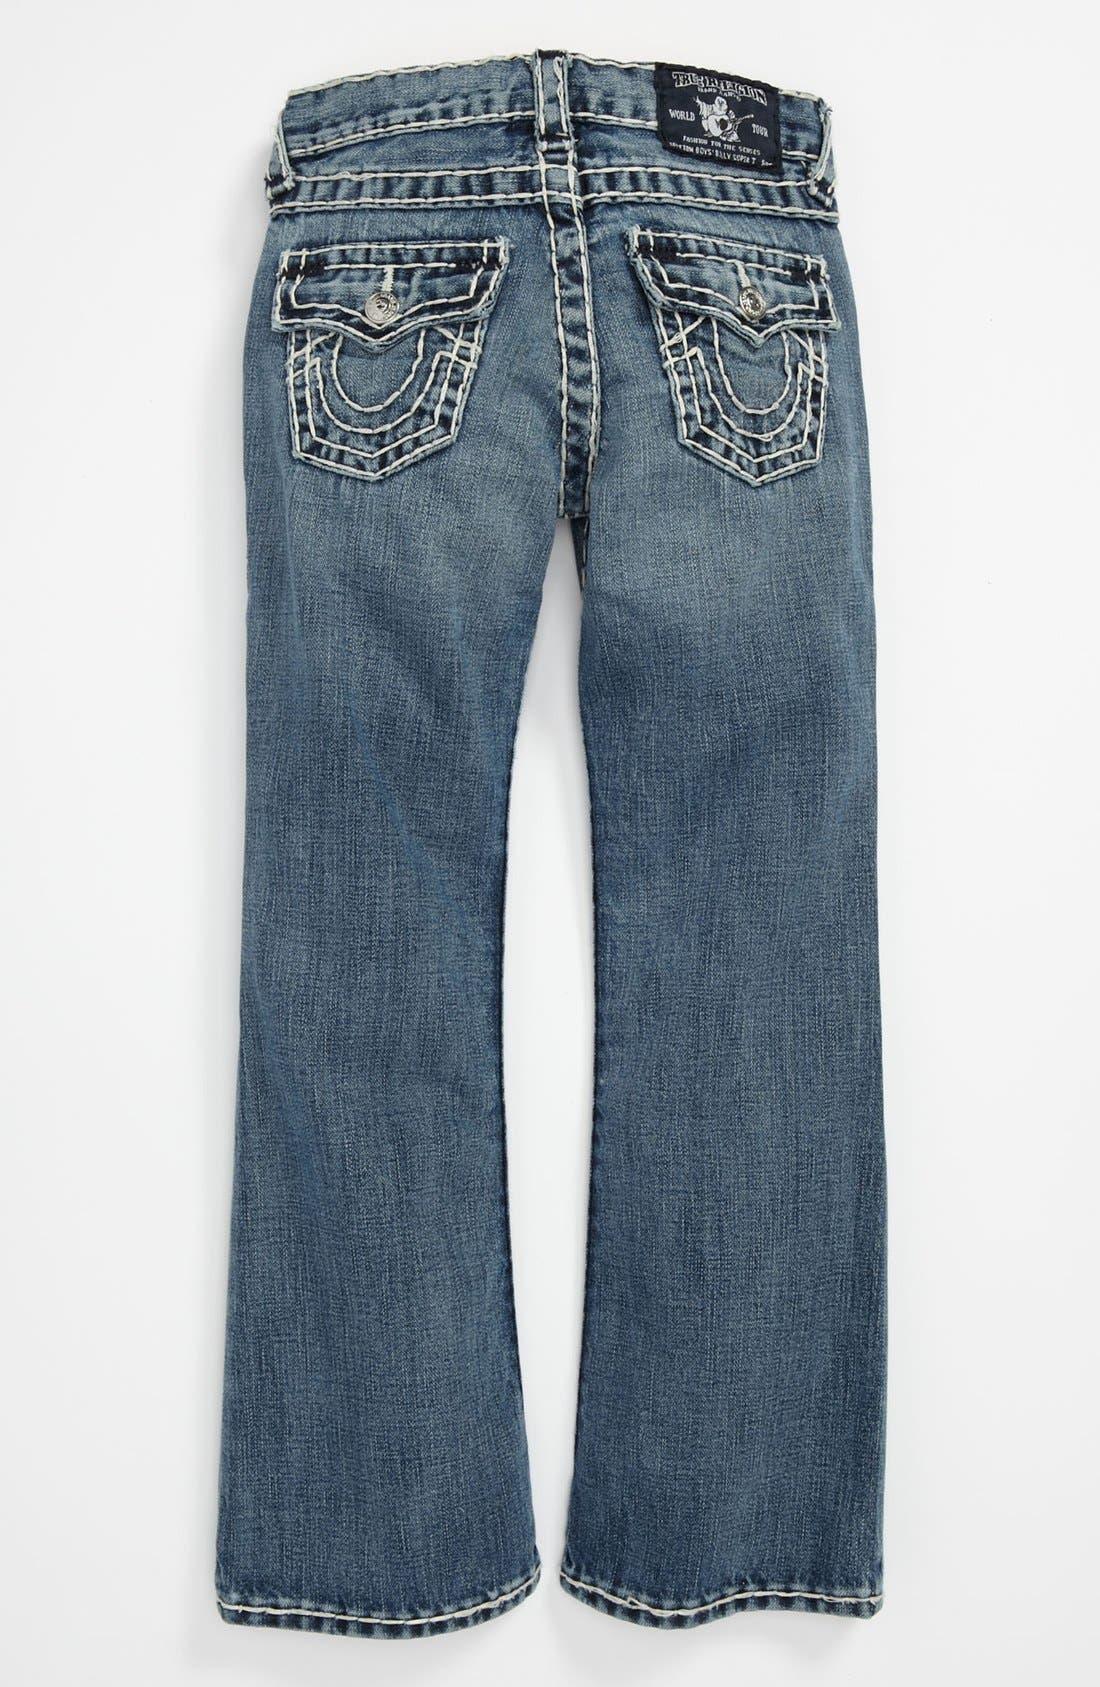 Alternate Image 1 Selected - True Religion Brand Jeans 'Jack' Bootcut Jeans (Big Boys)